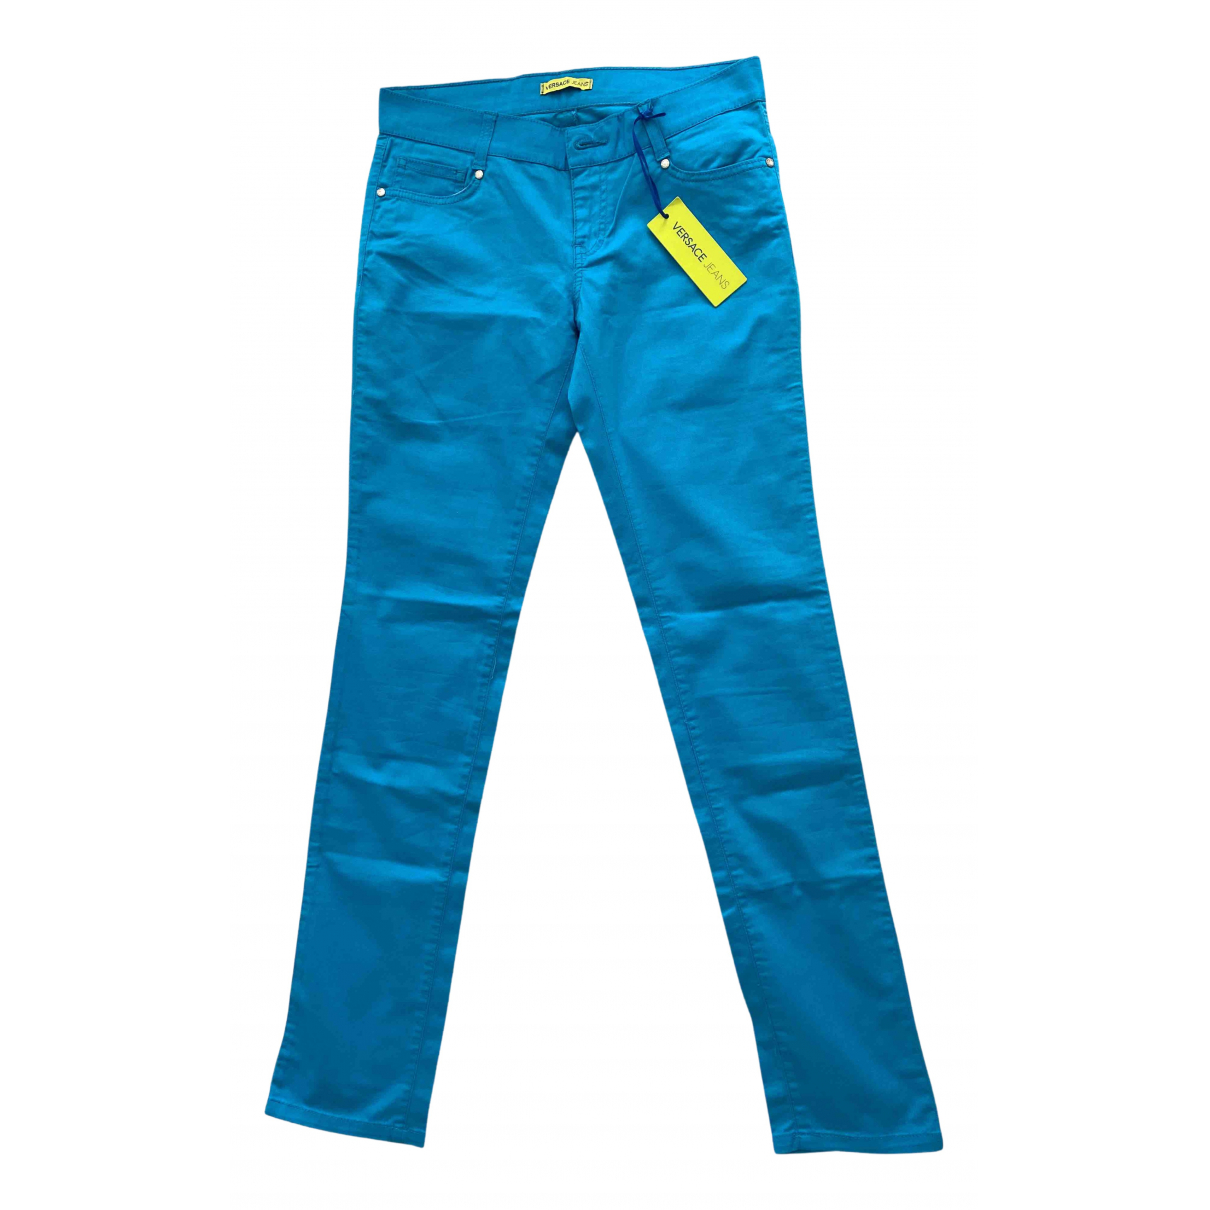 Versace Jeans N Blue Cotton Jeans for Women 37 FR